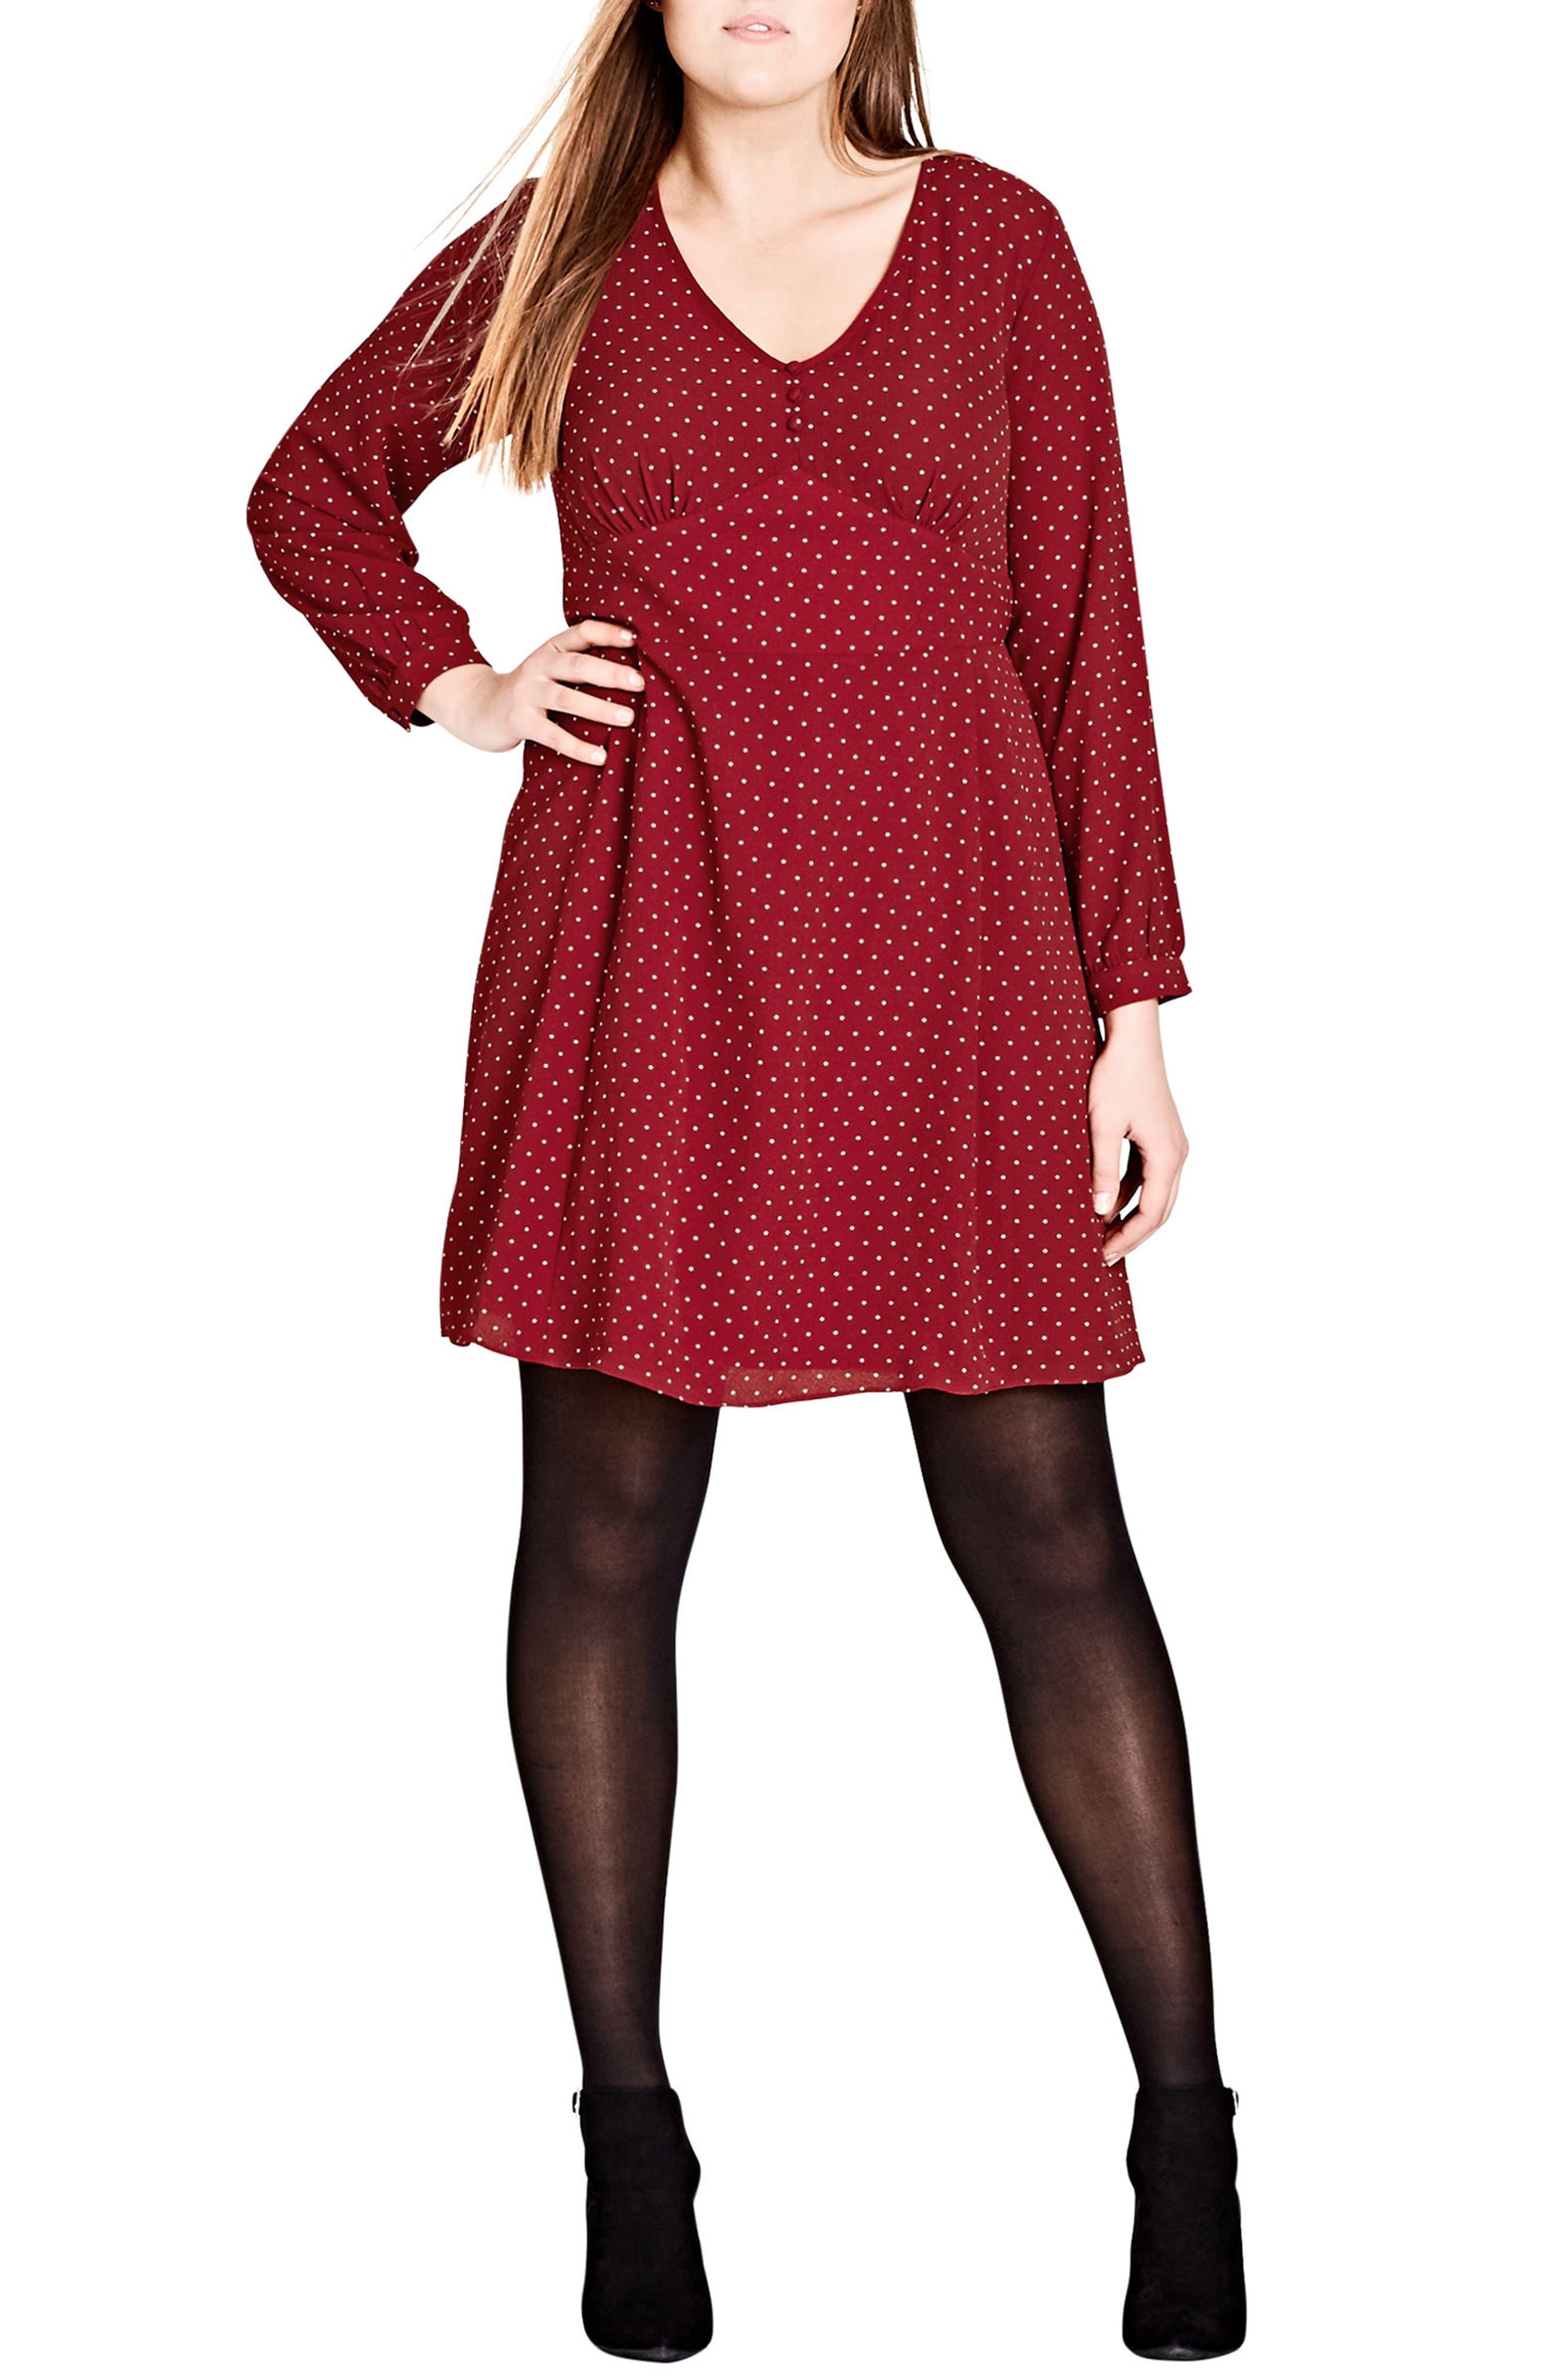 Sweet Nothing Polka Dot Dress,                         Main,                         color, Red Rose